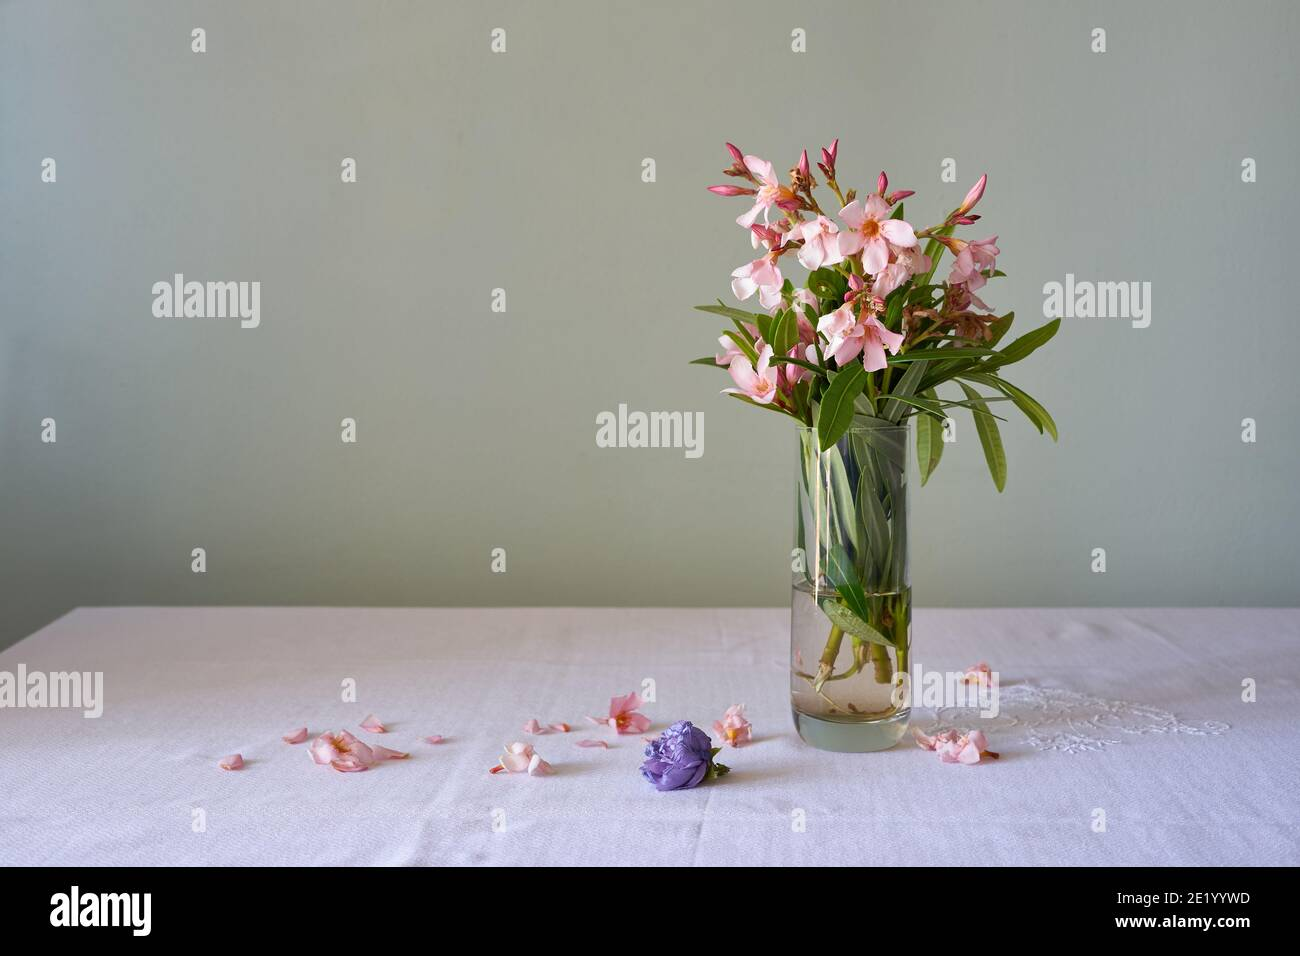 bouquet of flowers in glass with water, fallen oleanders Stock Photo